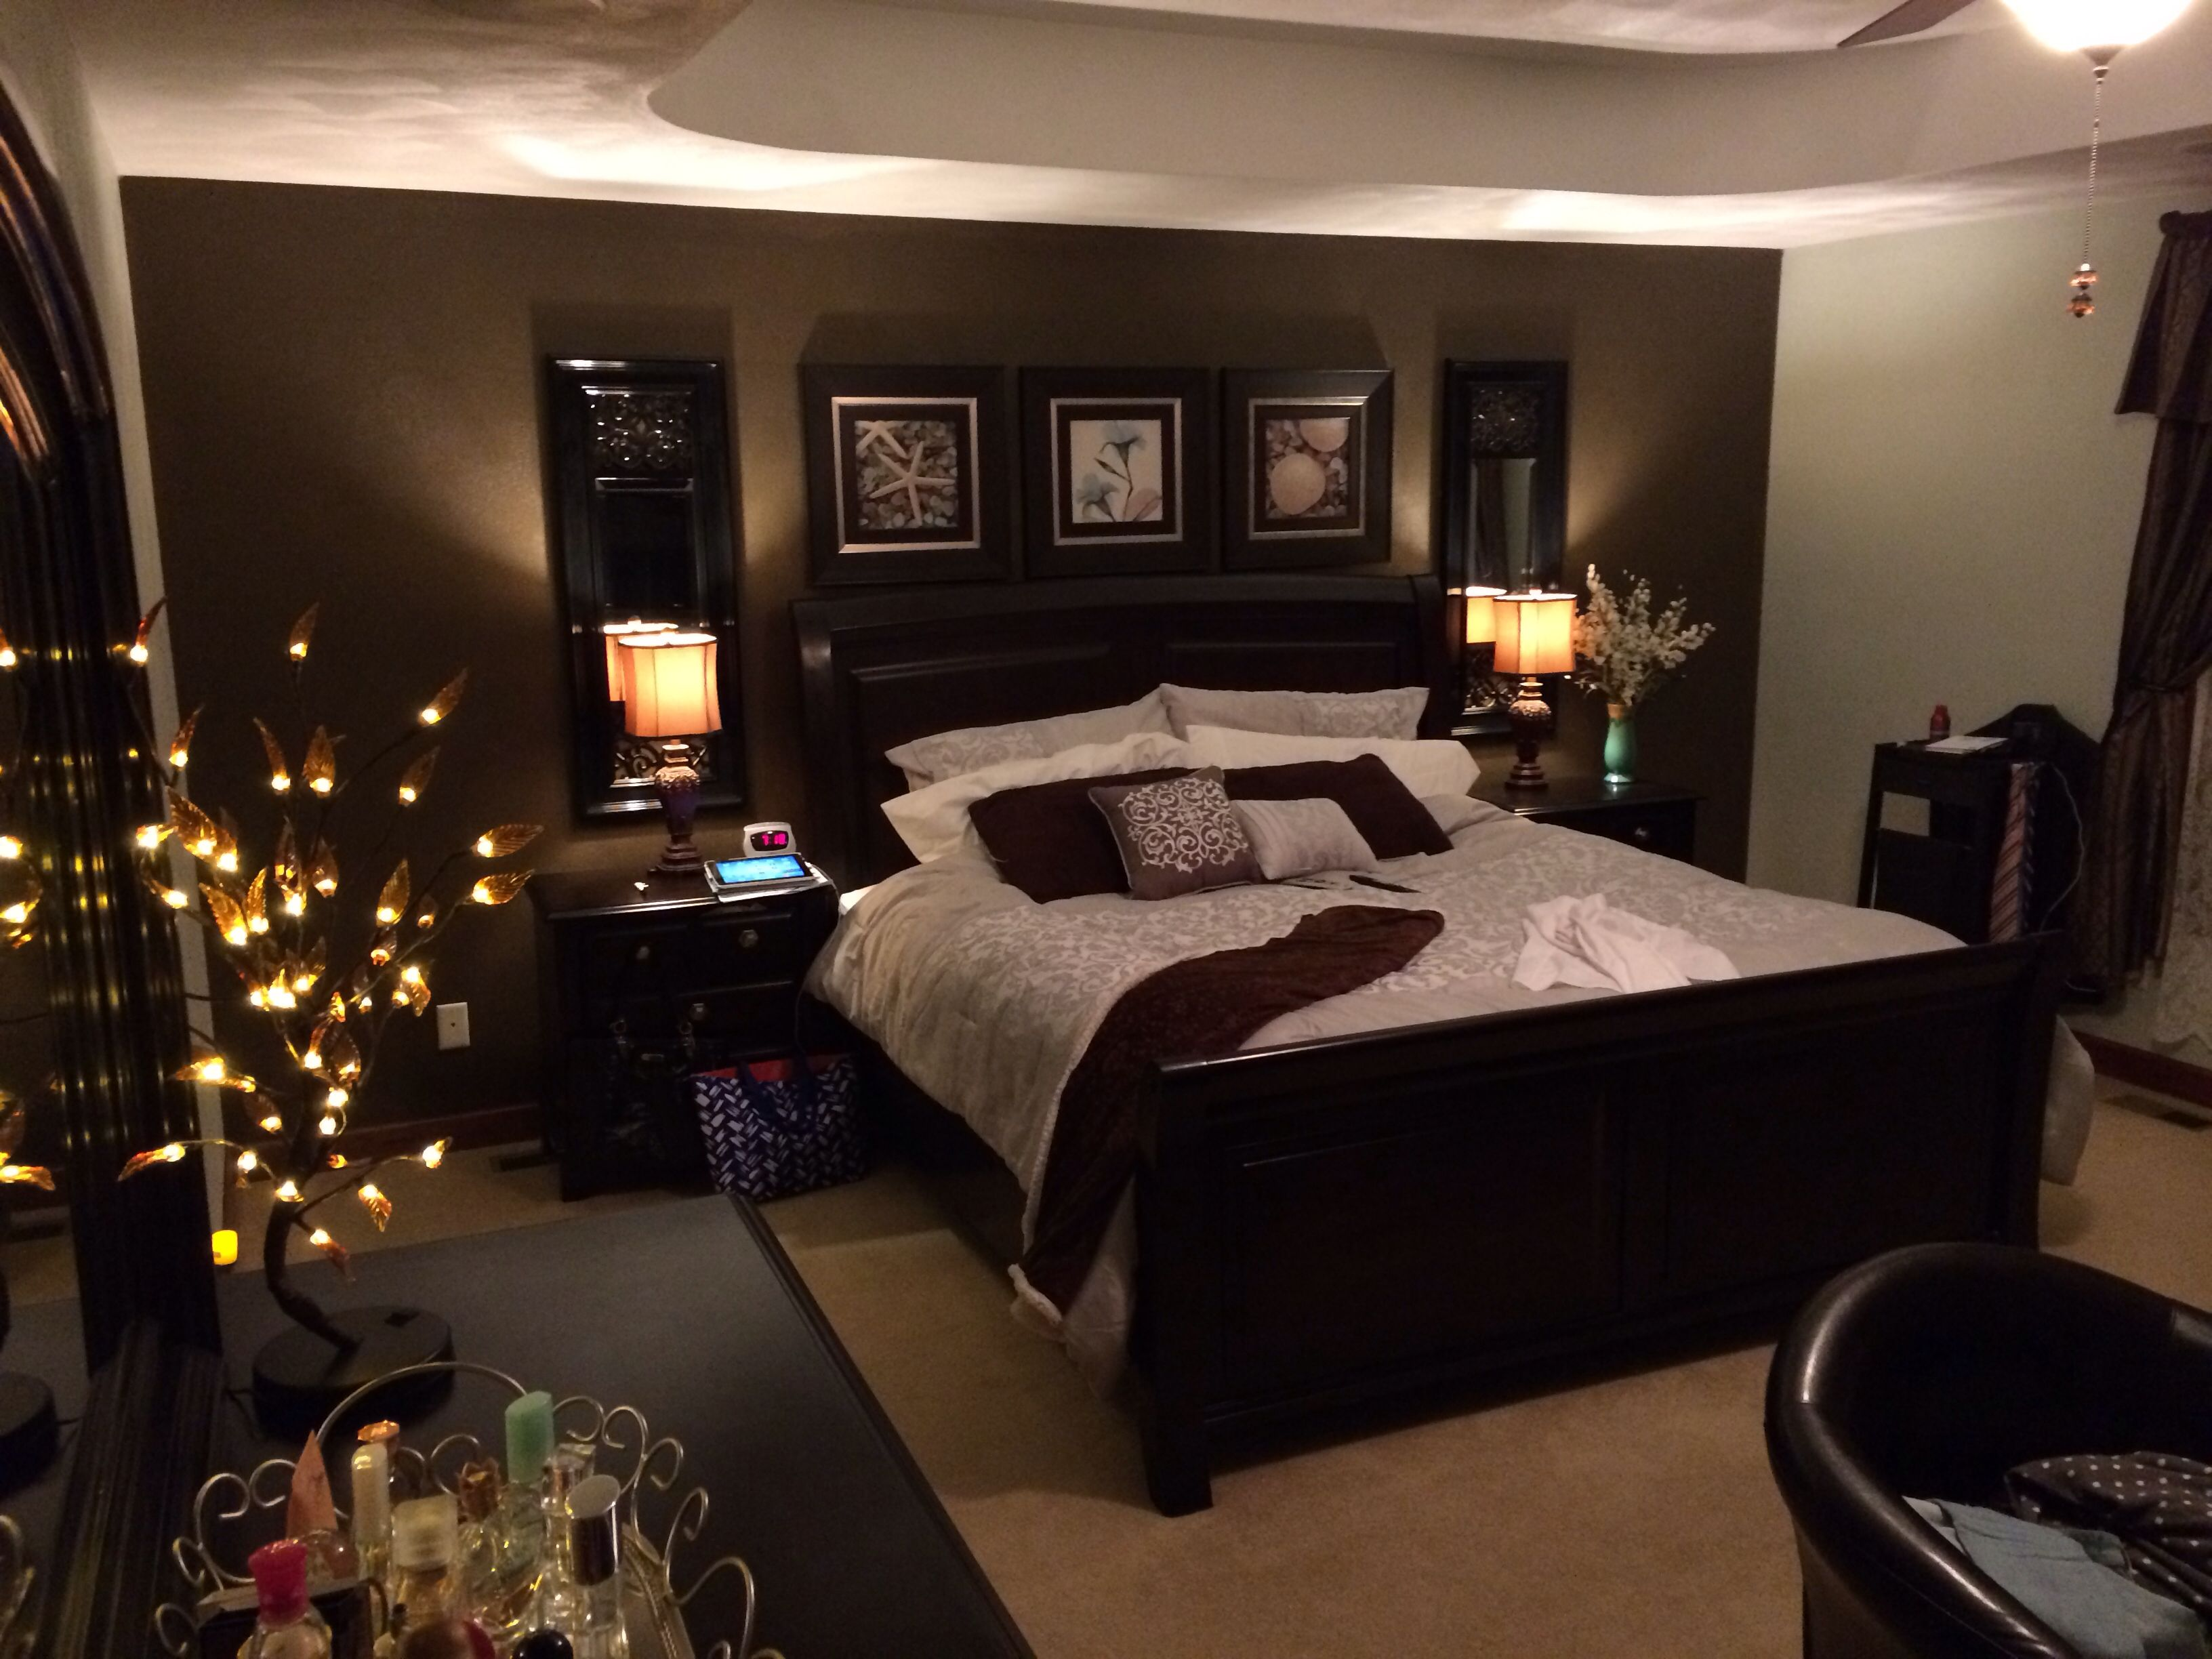 Elegant bedroom decor - chocolate brown, black, sage and ...